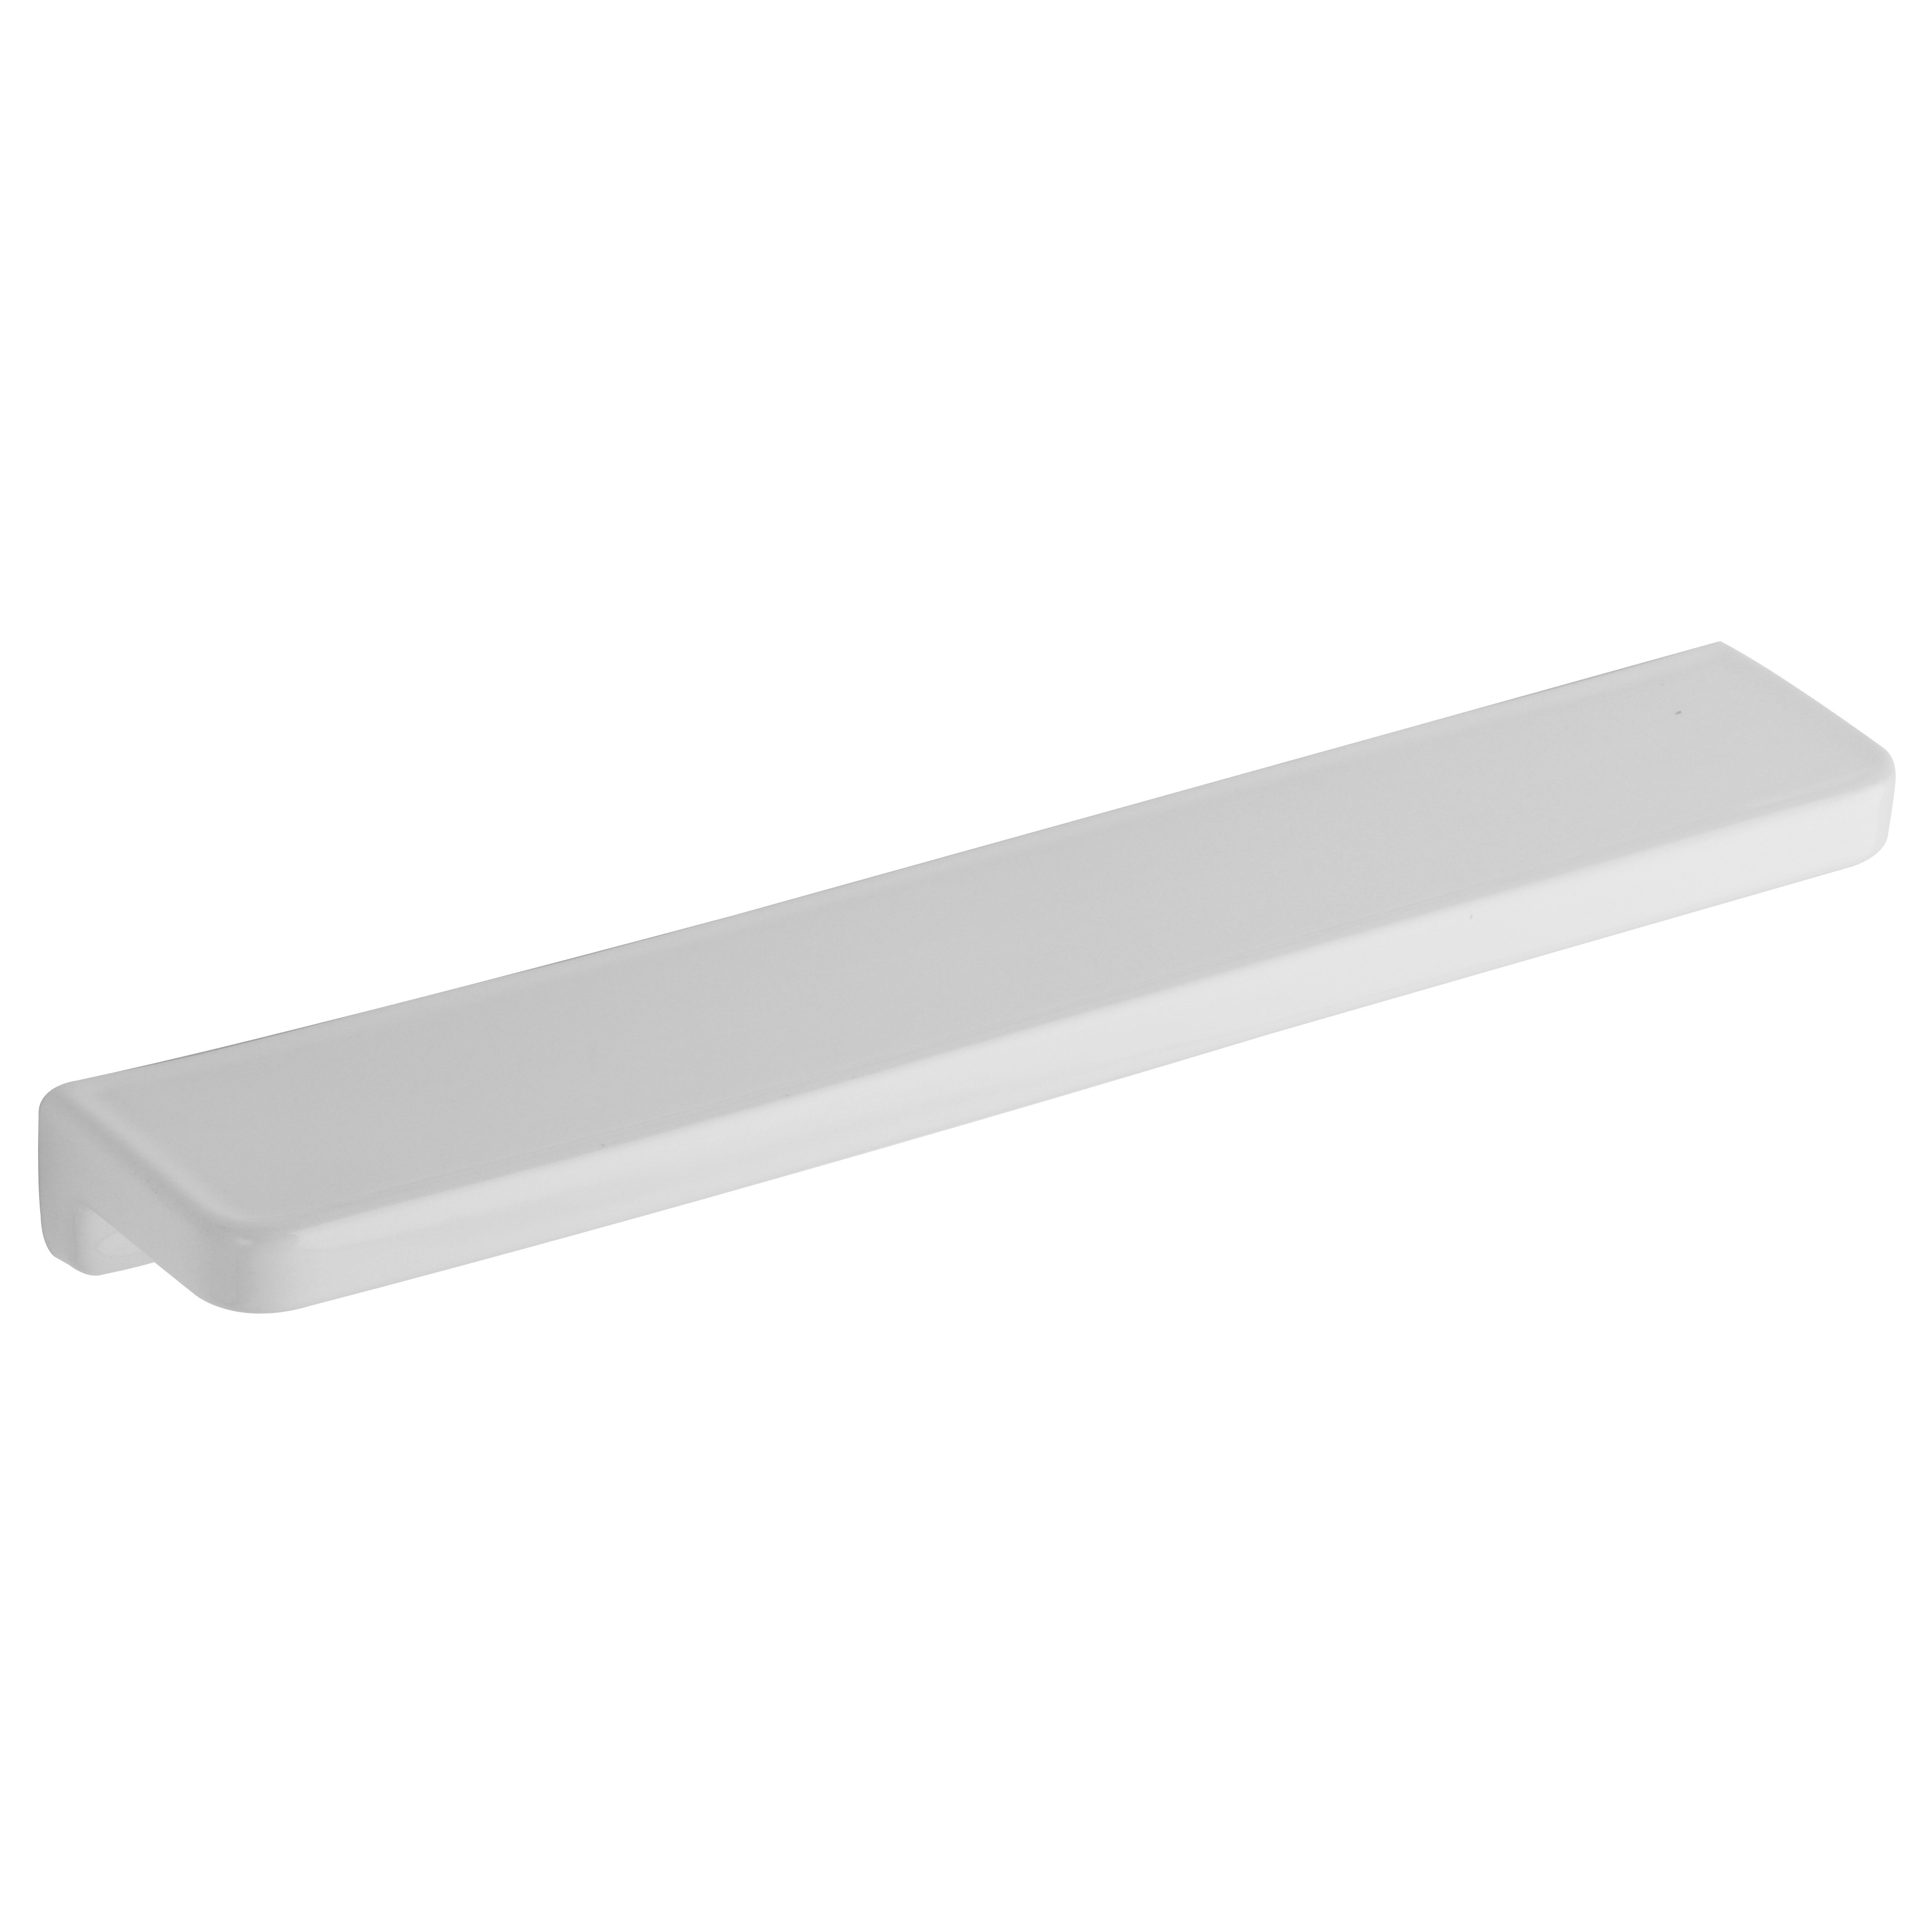 Sphinx Serie 300 basic planchet 60 cm, wit